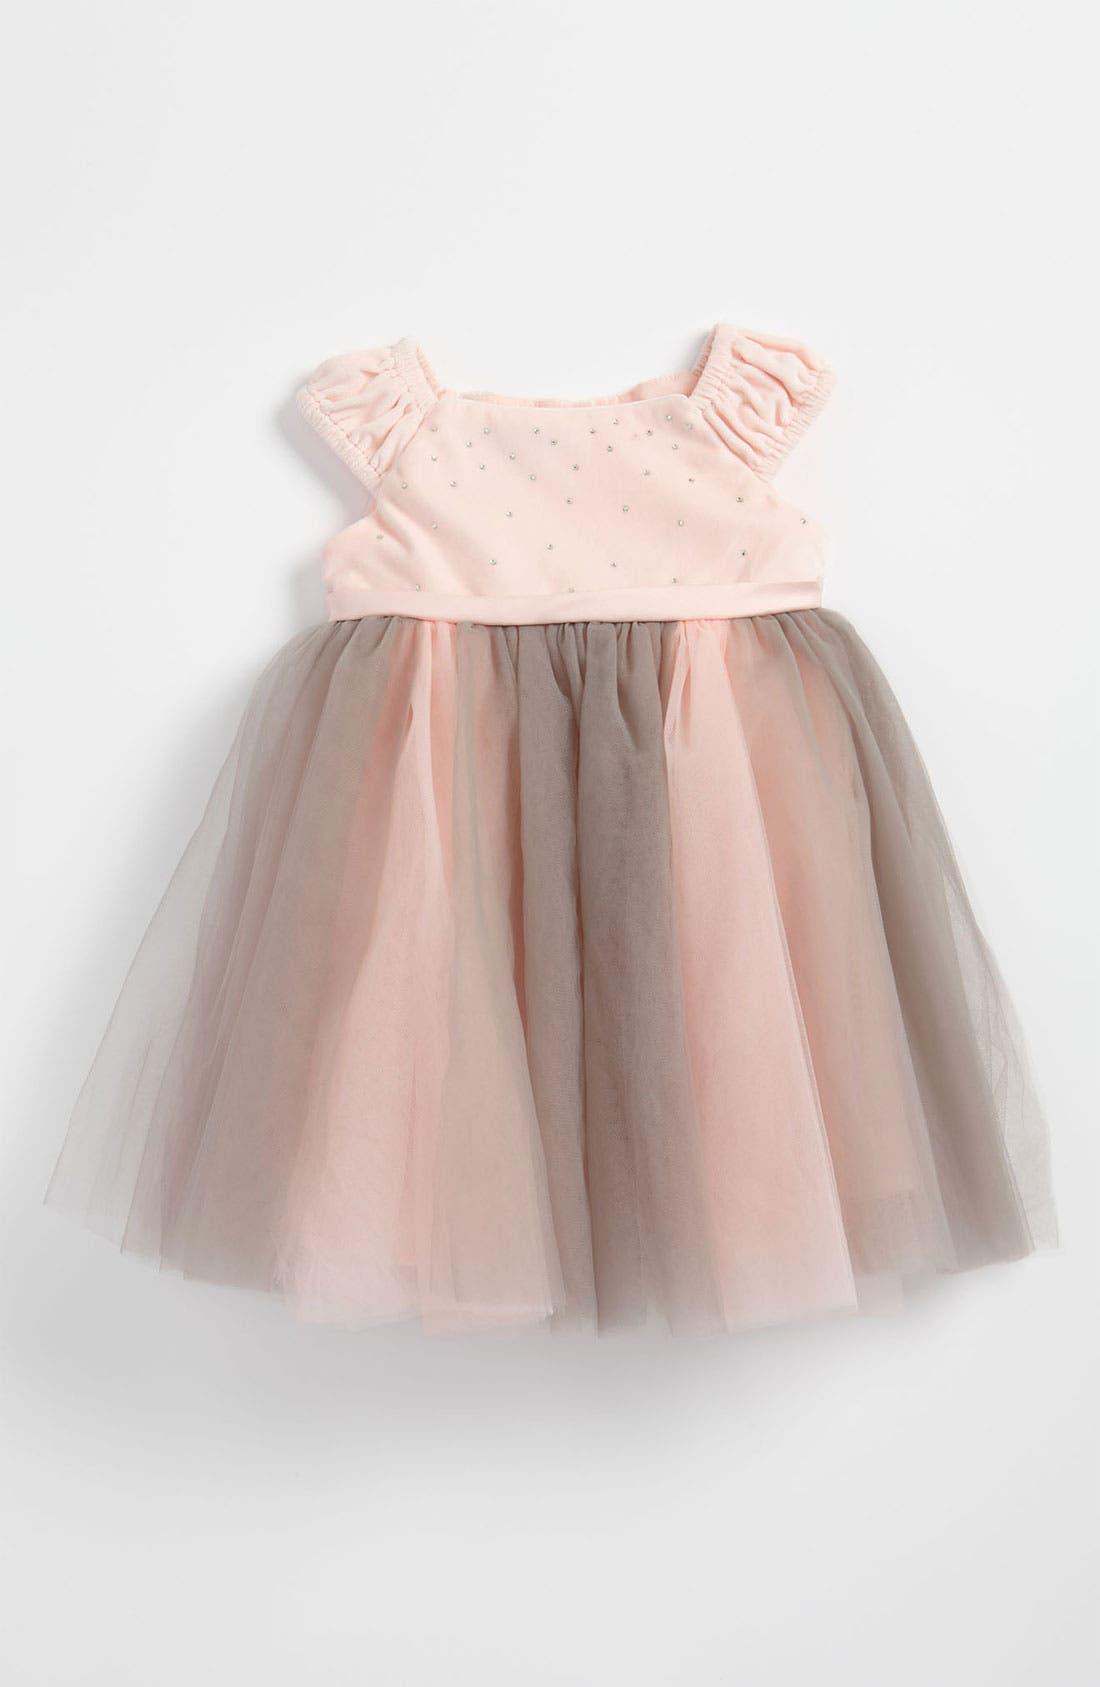 Alternate Image 1 Selected - Biscotti Tulle Ballerina Dress (Infant)